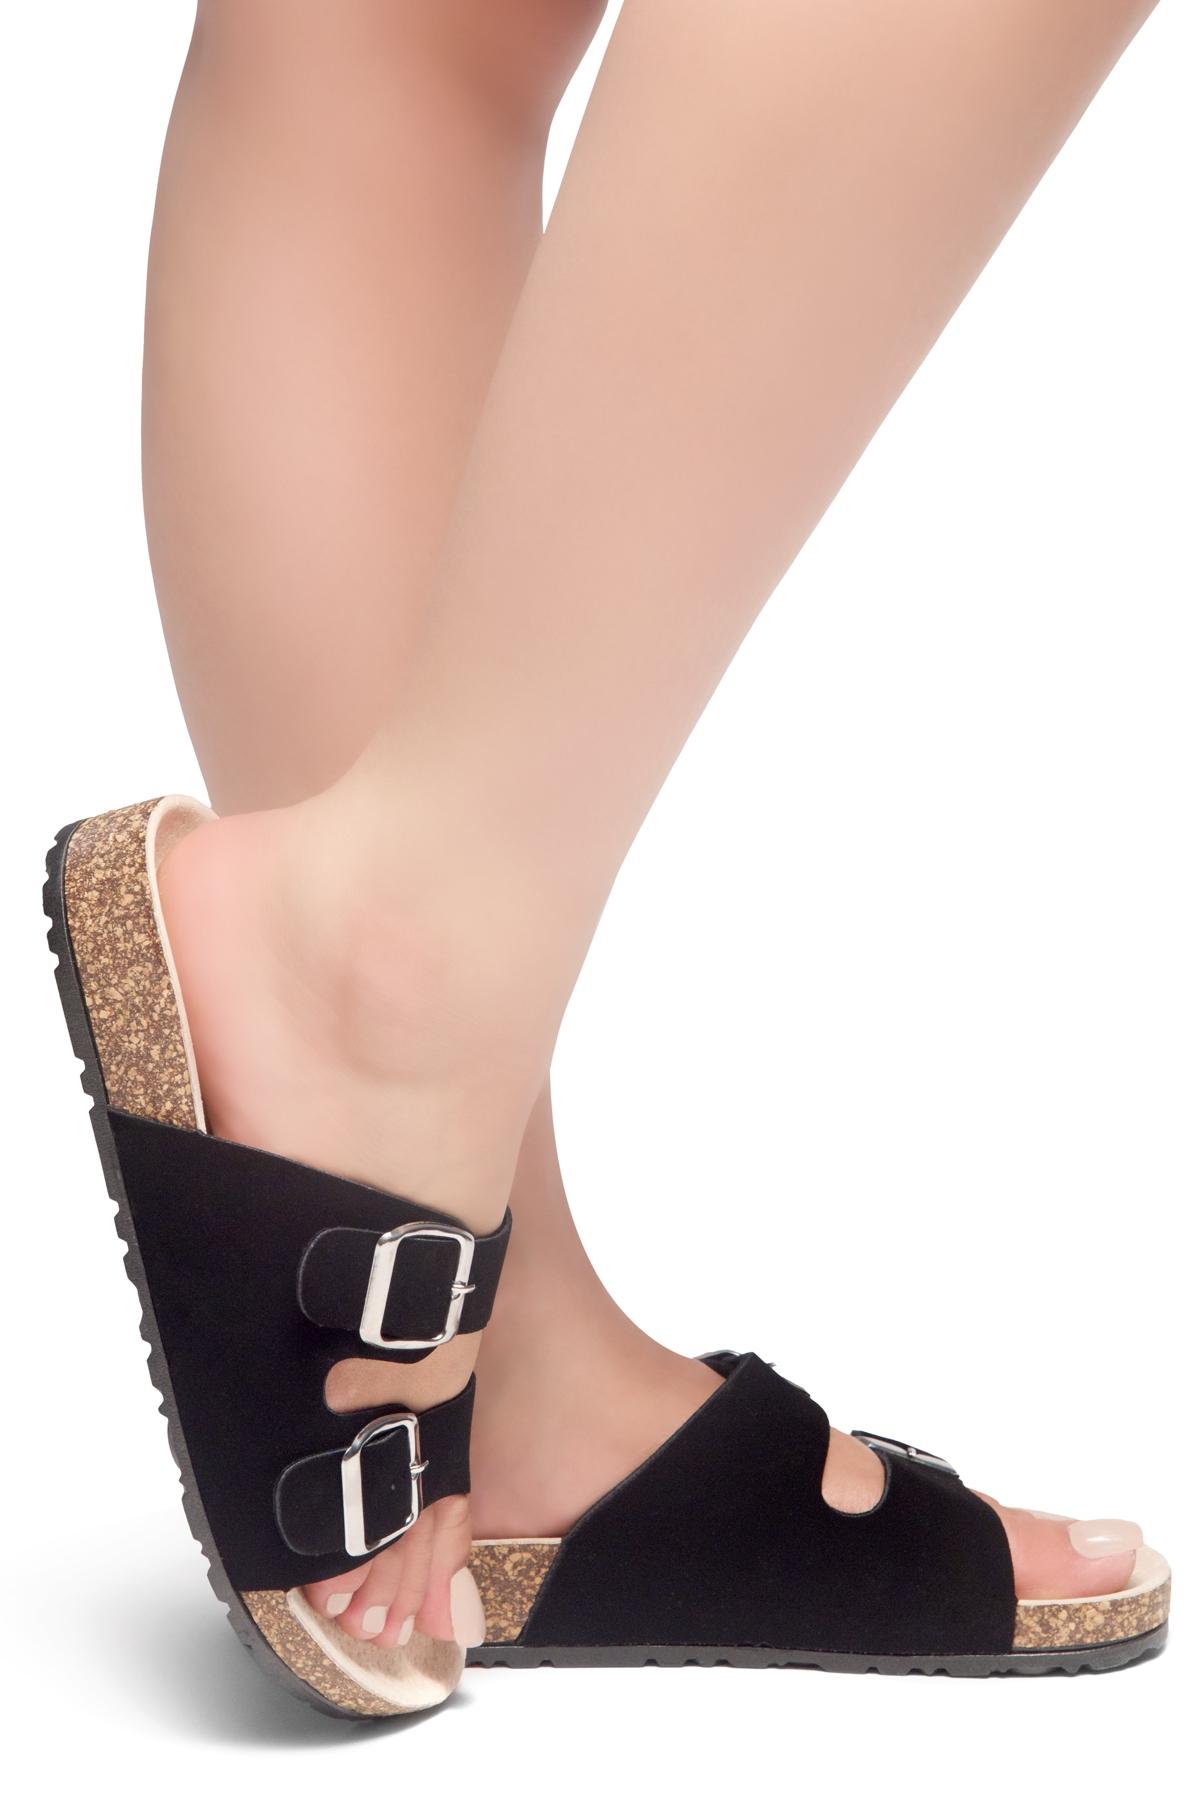 976e940a9105b7 HerStyle SOFTEY-Open Toe Buckled Cork Slide Sandal(Black)